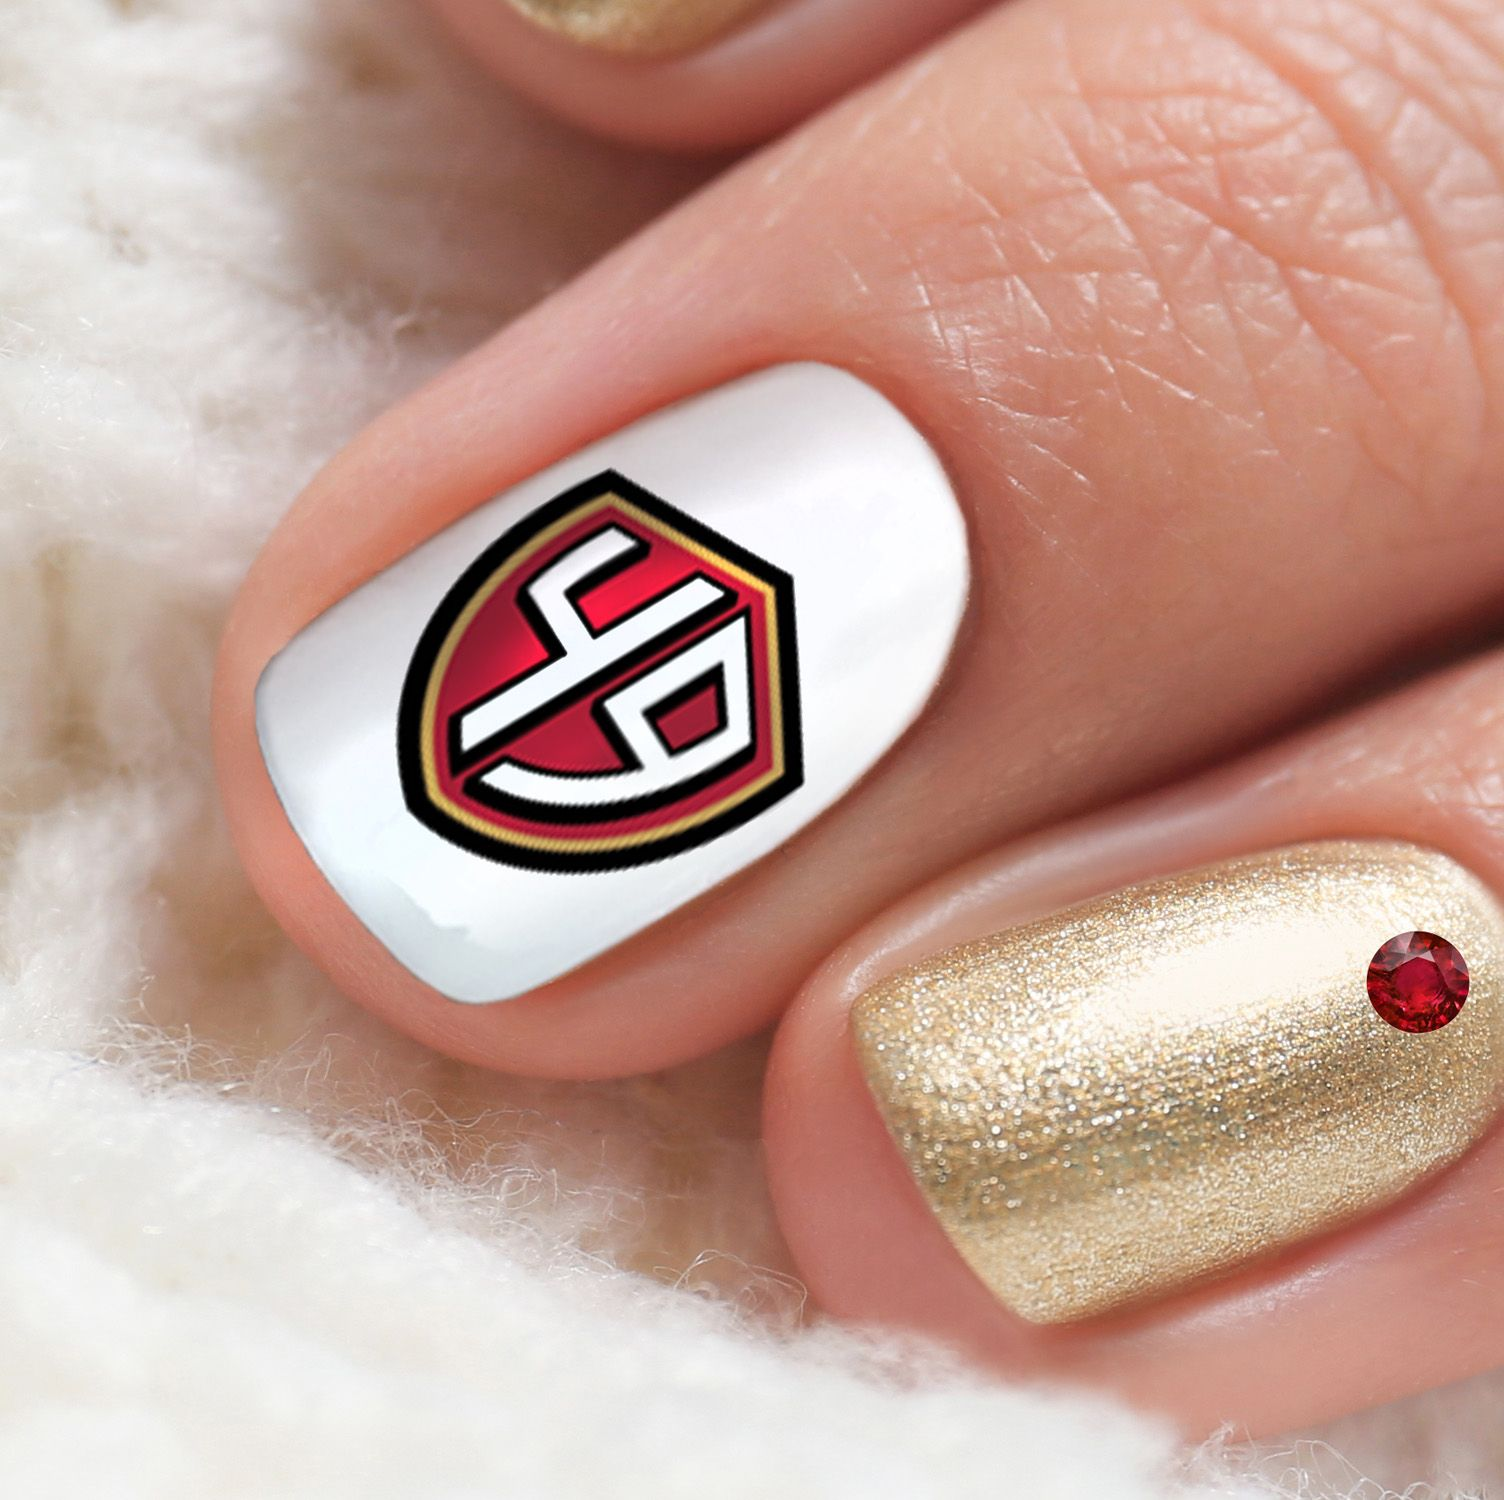 Details About San Francisco 49ers Football Nail Art Decals Salon Quality Football Nail Art Football Nails 49ers Nails